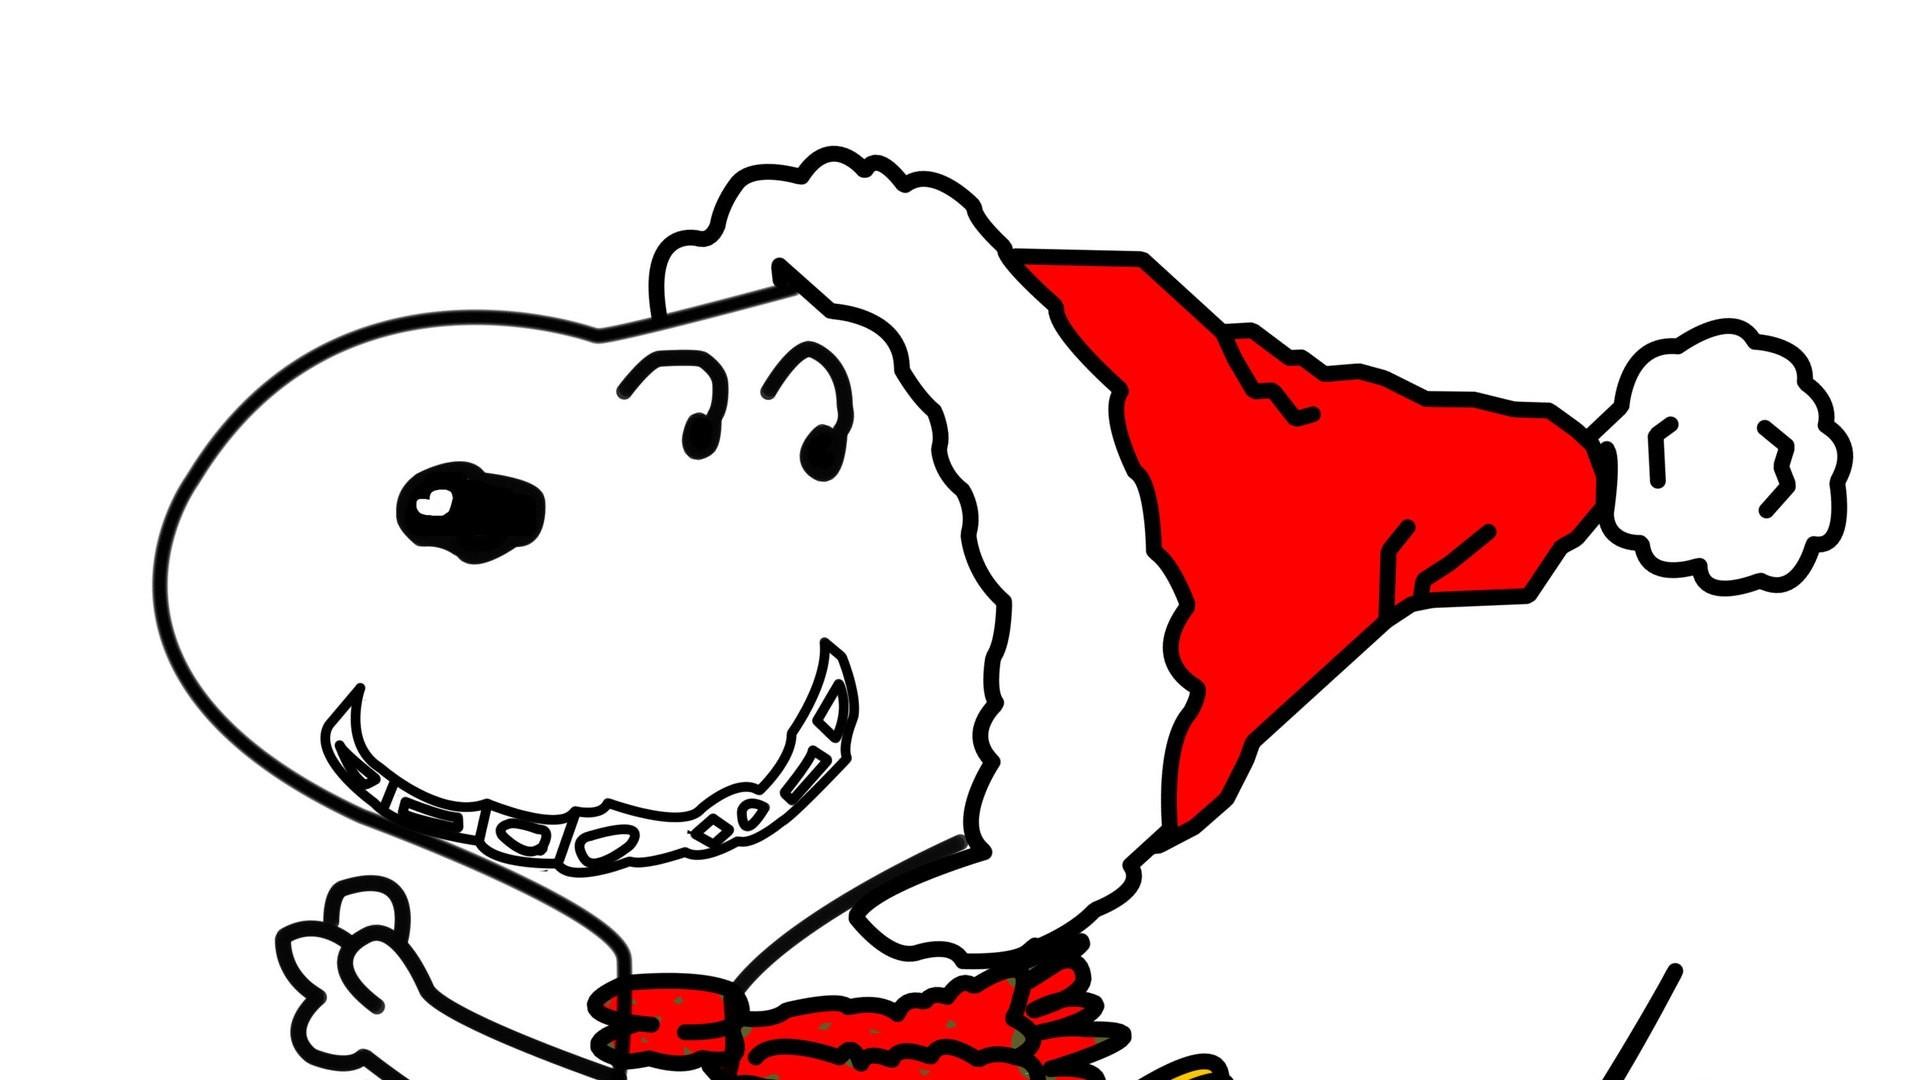 Gallery of Snoopy Christmas Wallpaper 8211 Snoopy Wallpaper HD For Desktop